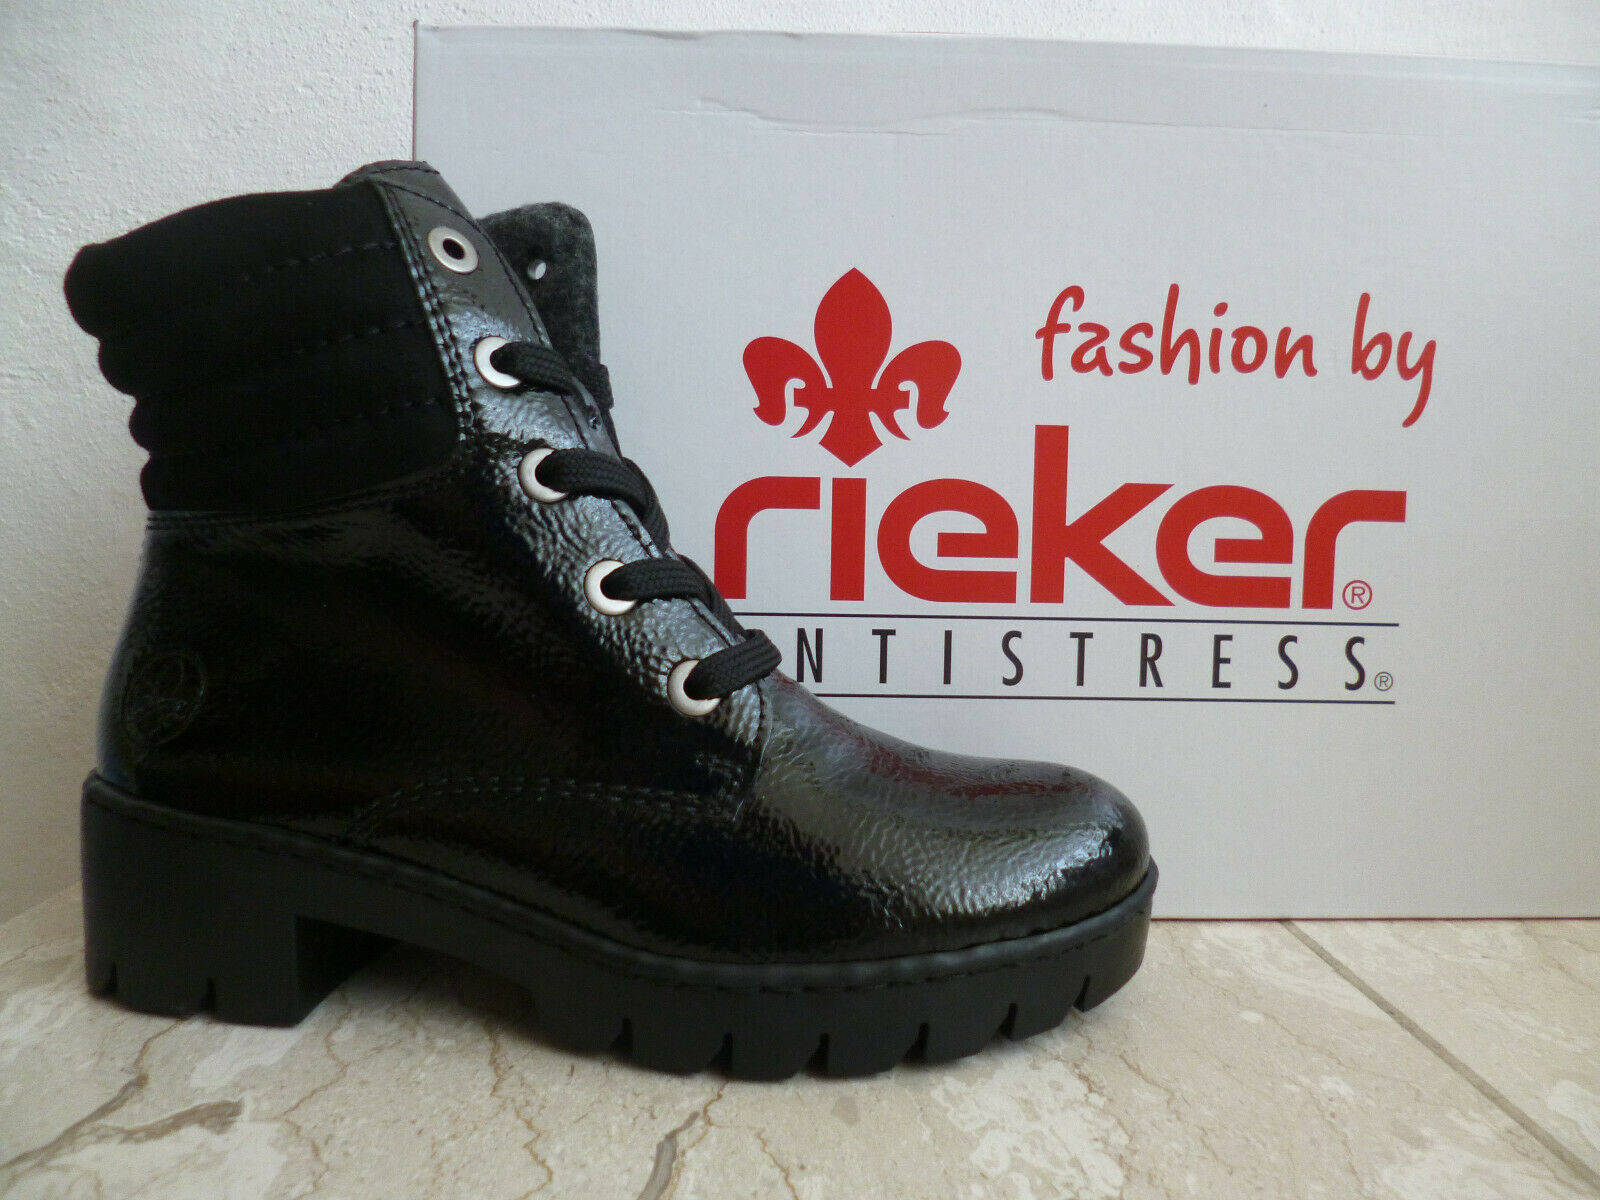 Rieker Damen Schnürstiefel Boots Winterschuhe schwarz Lack X5704 NEU!